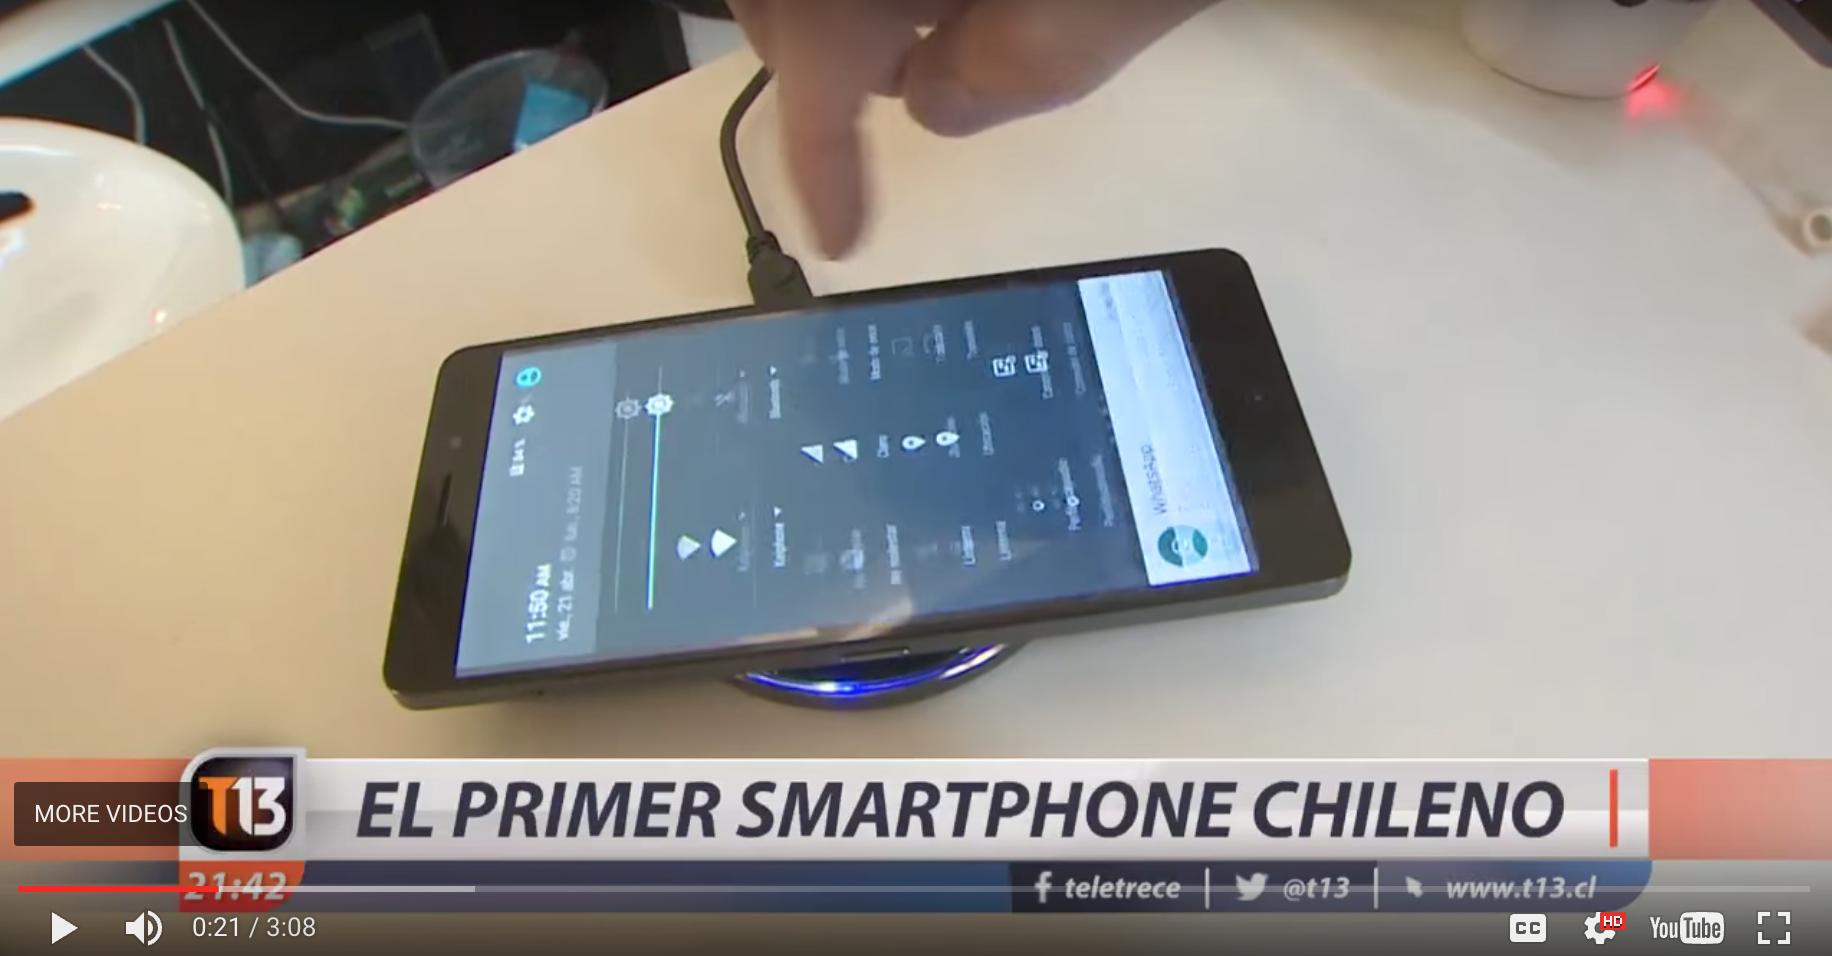 [VIDEO] Keiphone: el primer smartphone chileno